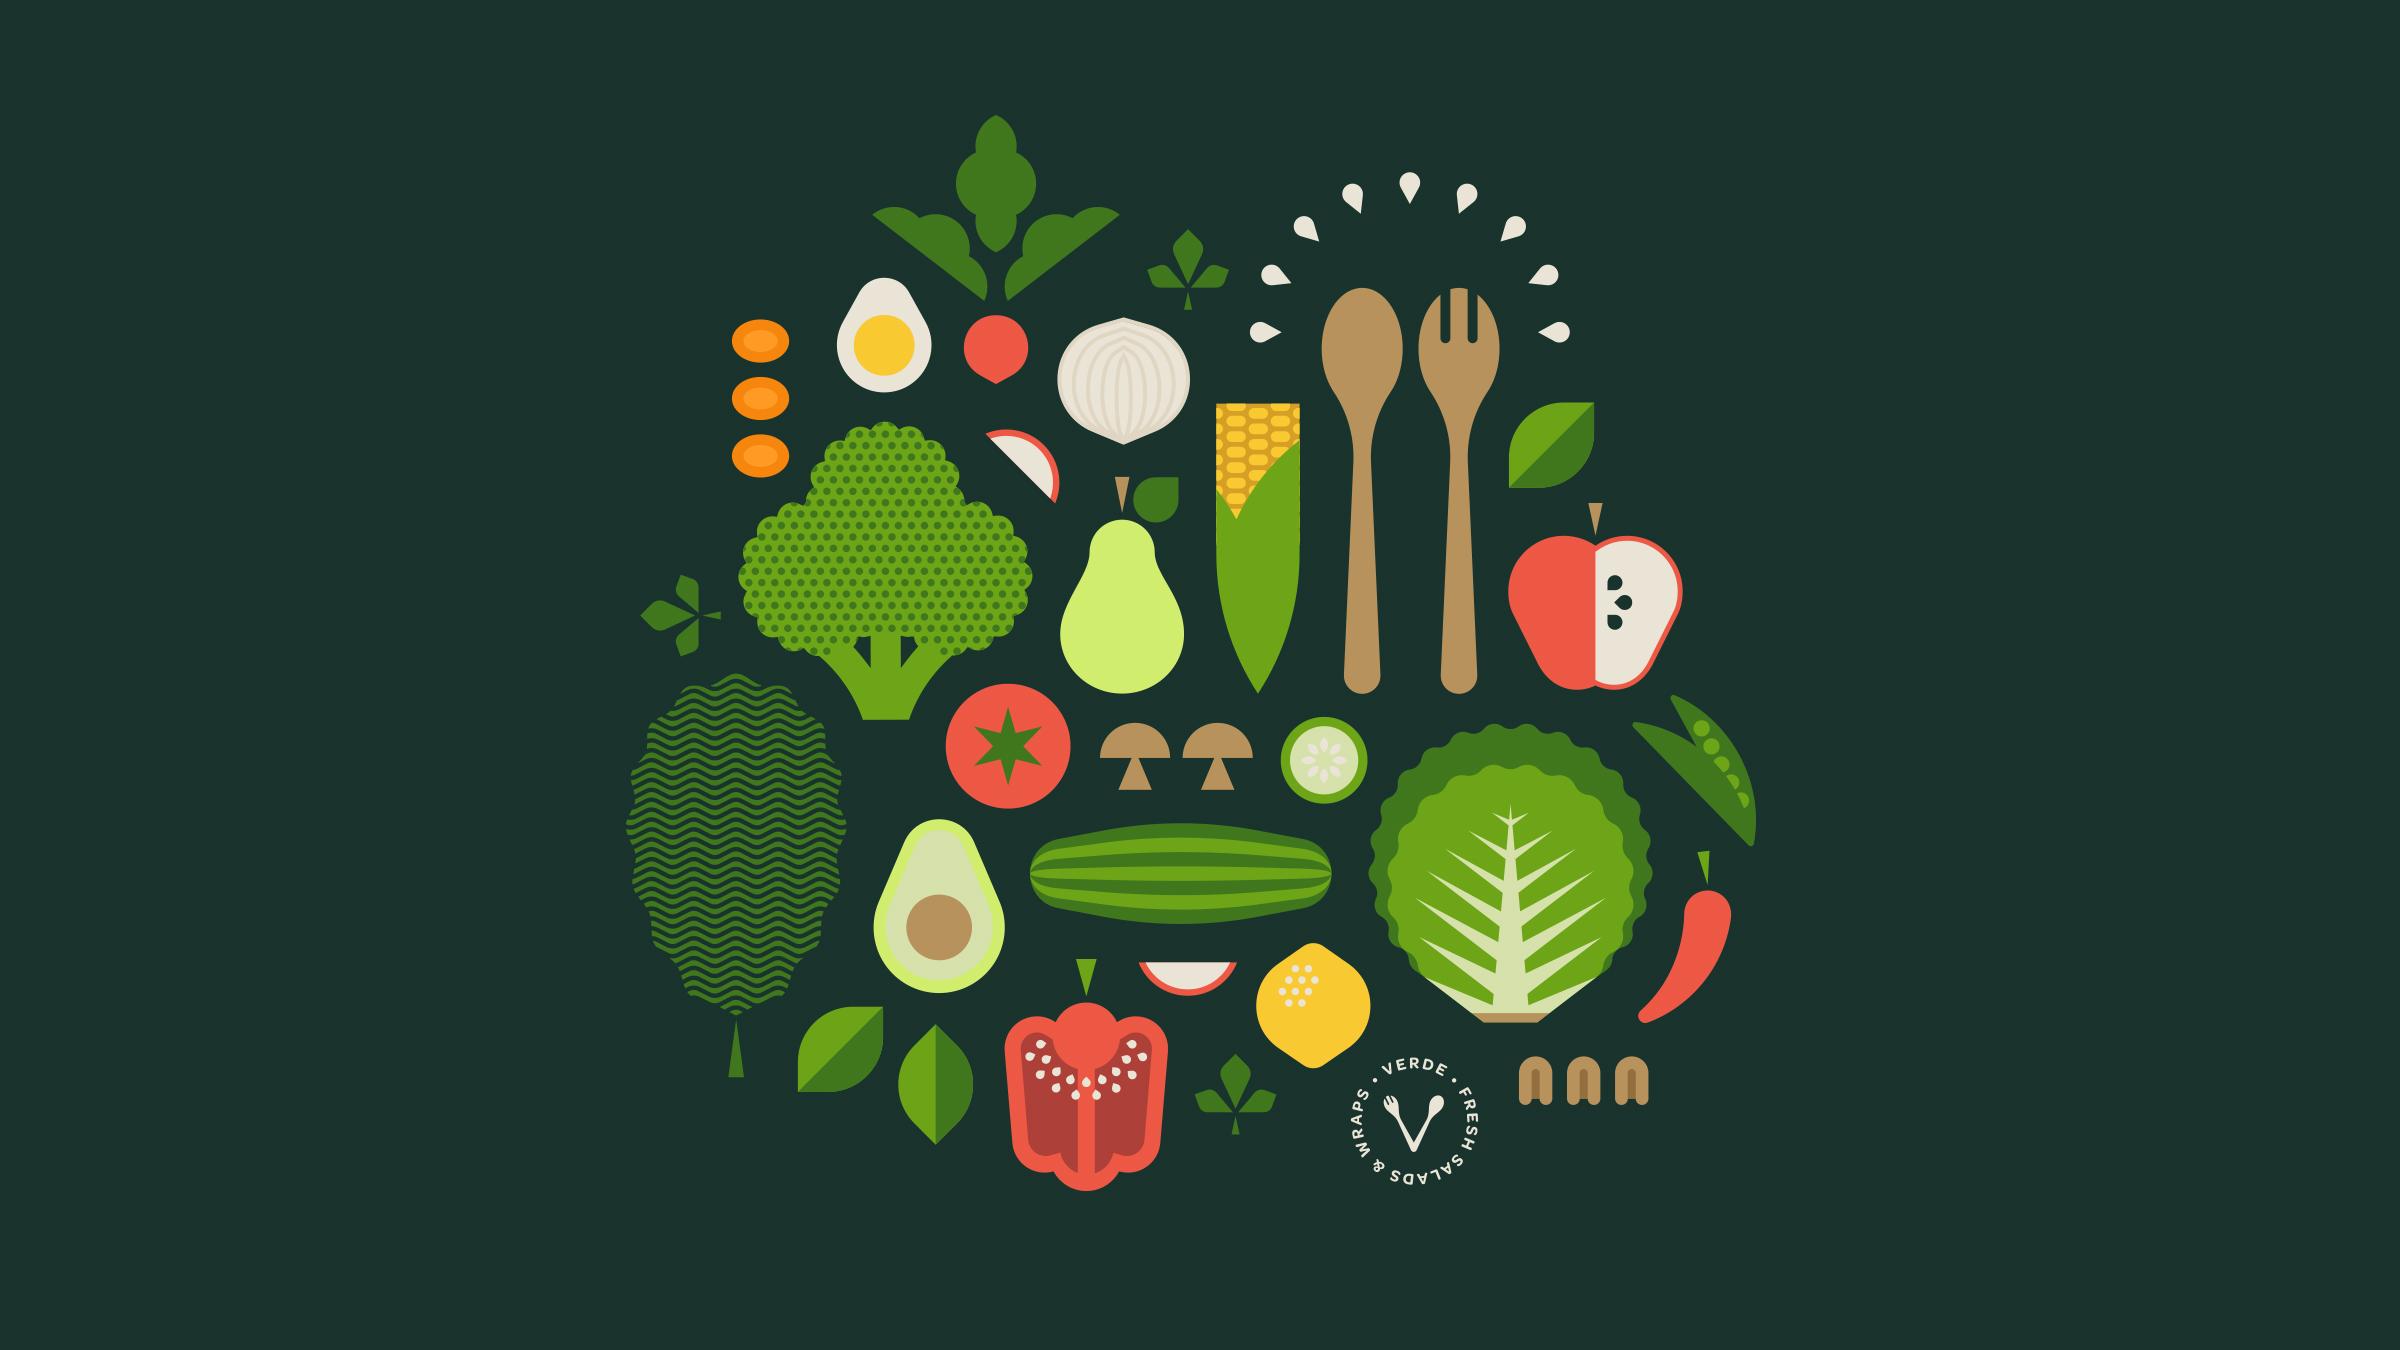 Verde Salad Restaurant Vegetable & Fruit Icons